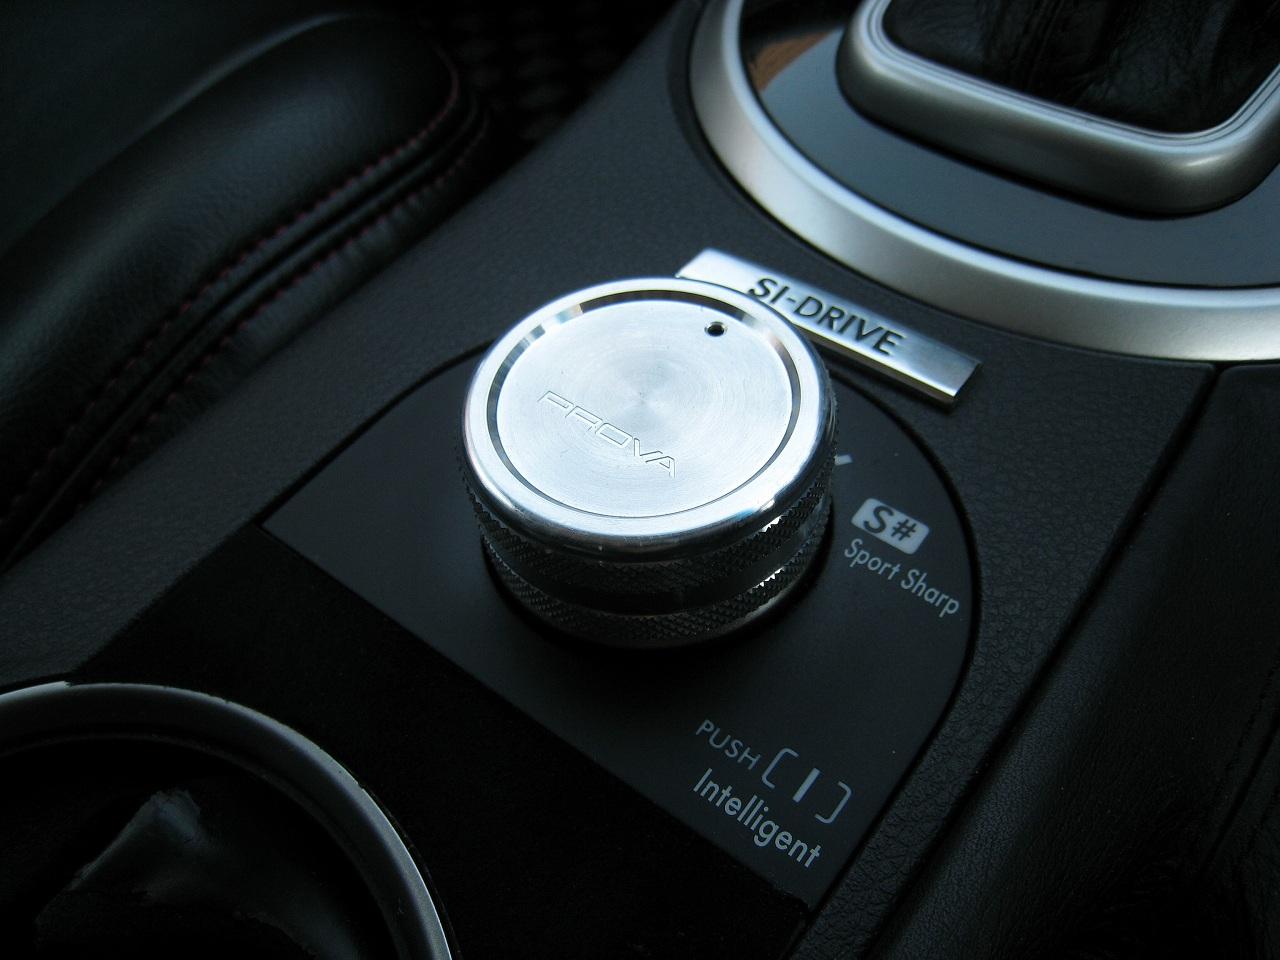 PROVA SI-DRIVE Dial (BP/BL D-用)